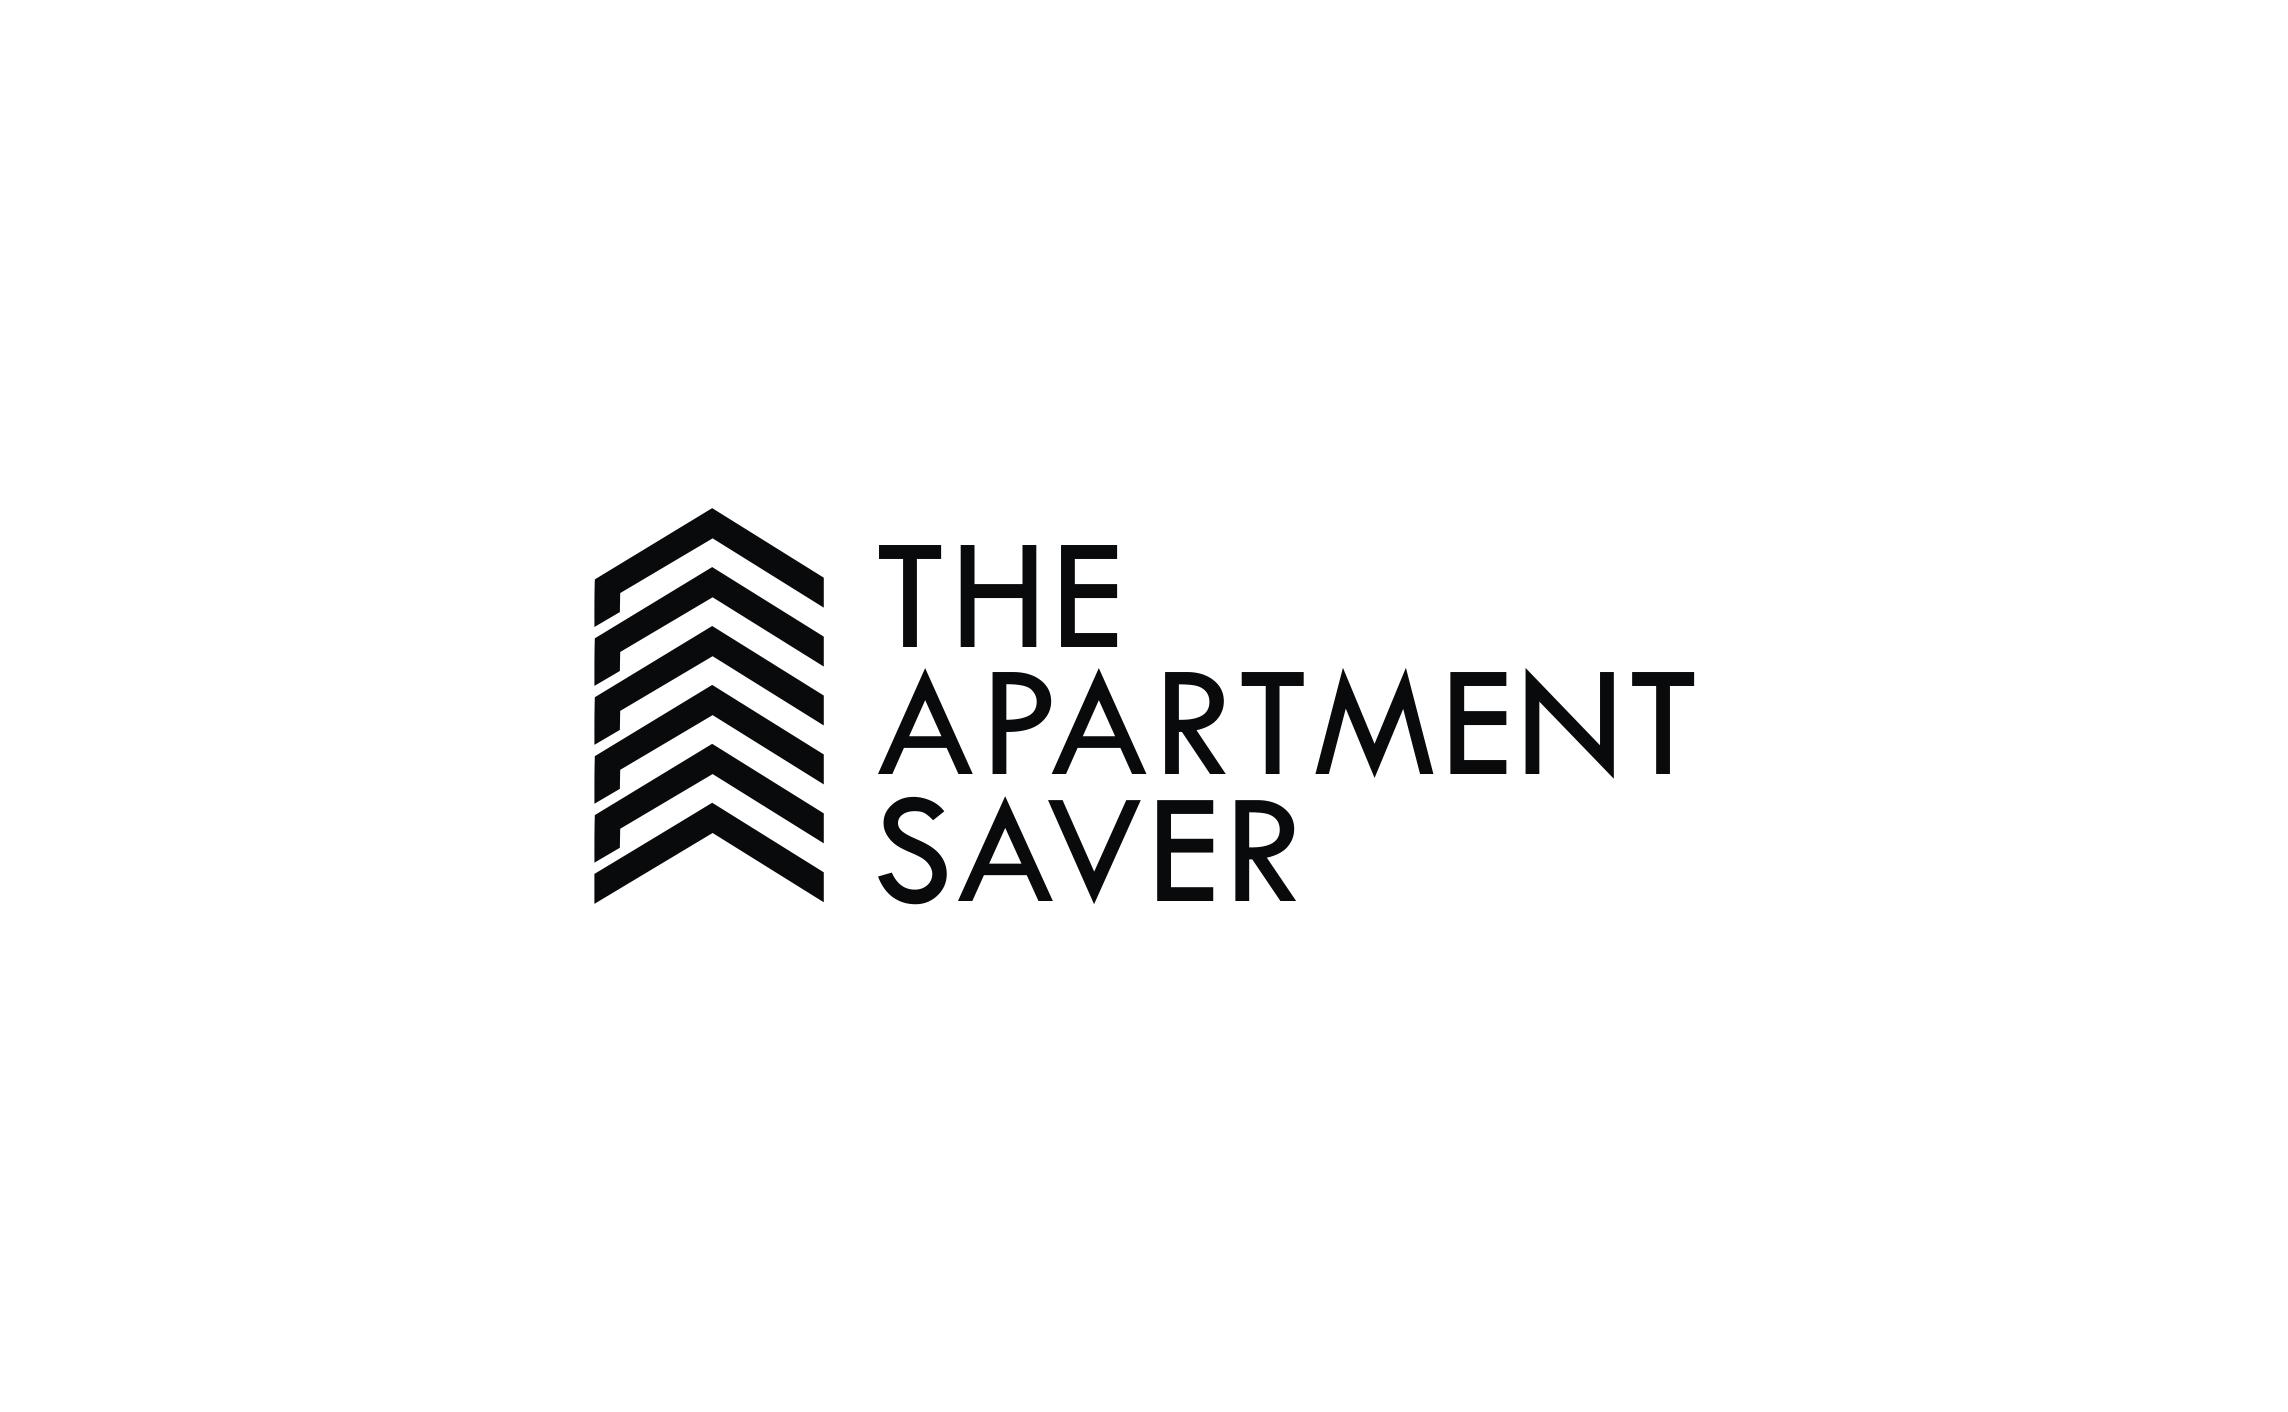 The Apartment Saver logo